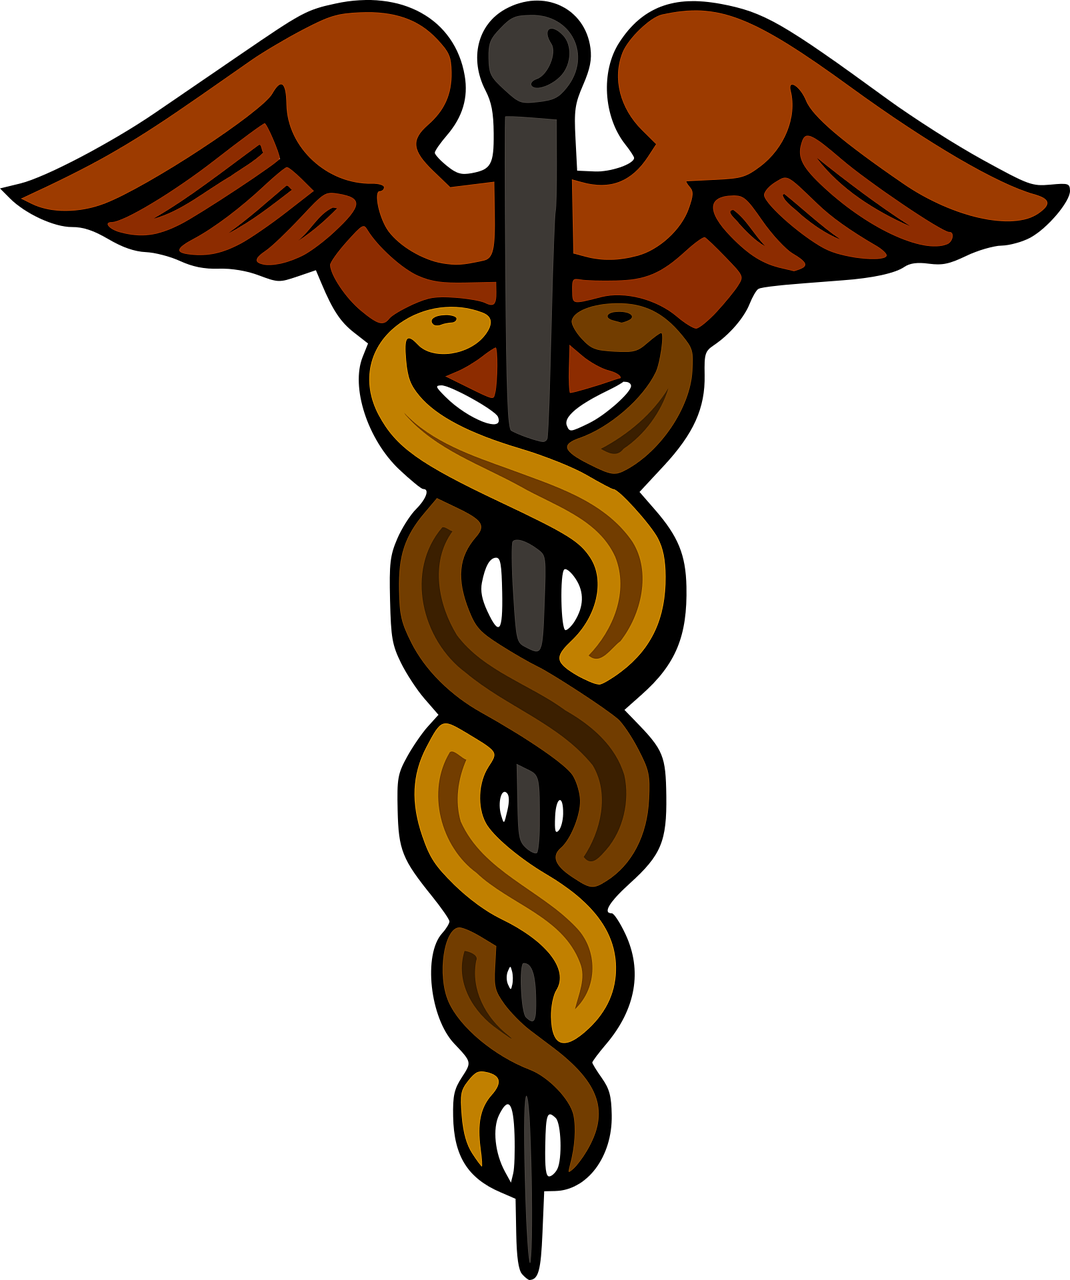 Staff of Hermes Caduceus as a symbol of medicine Greek.